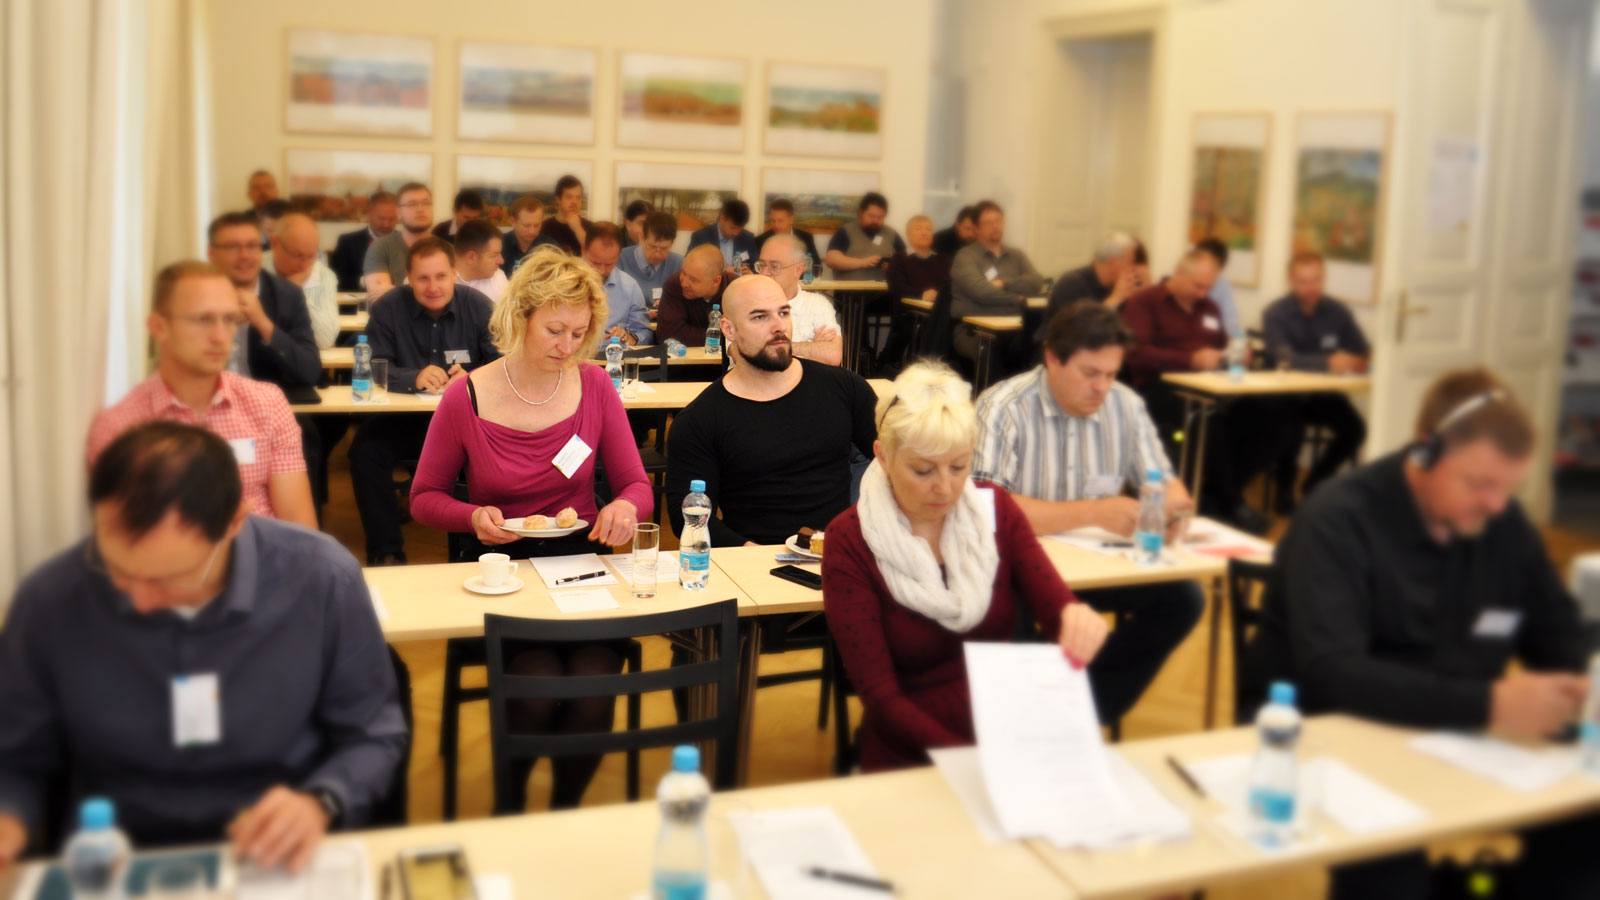 urviho-novinka-propagace-konference-digital-trust-paperless-08